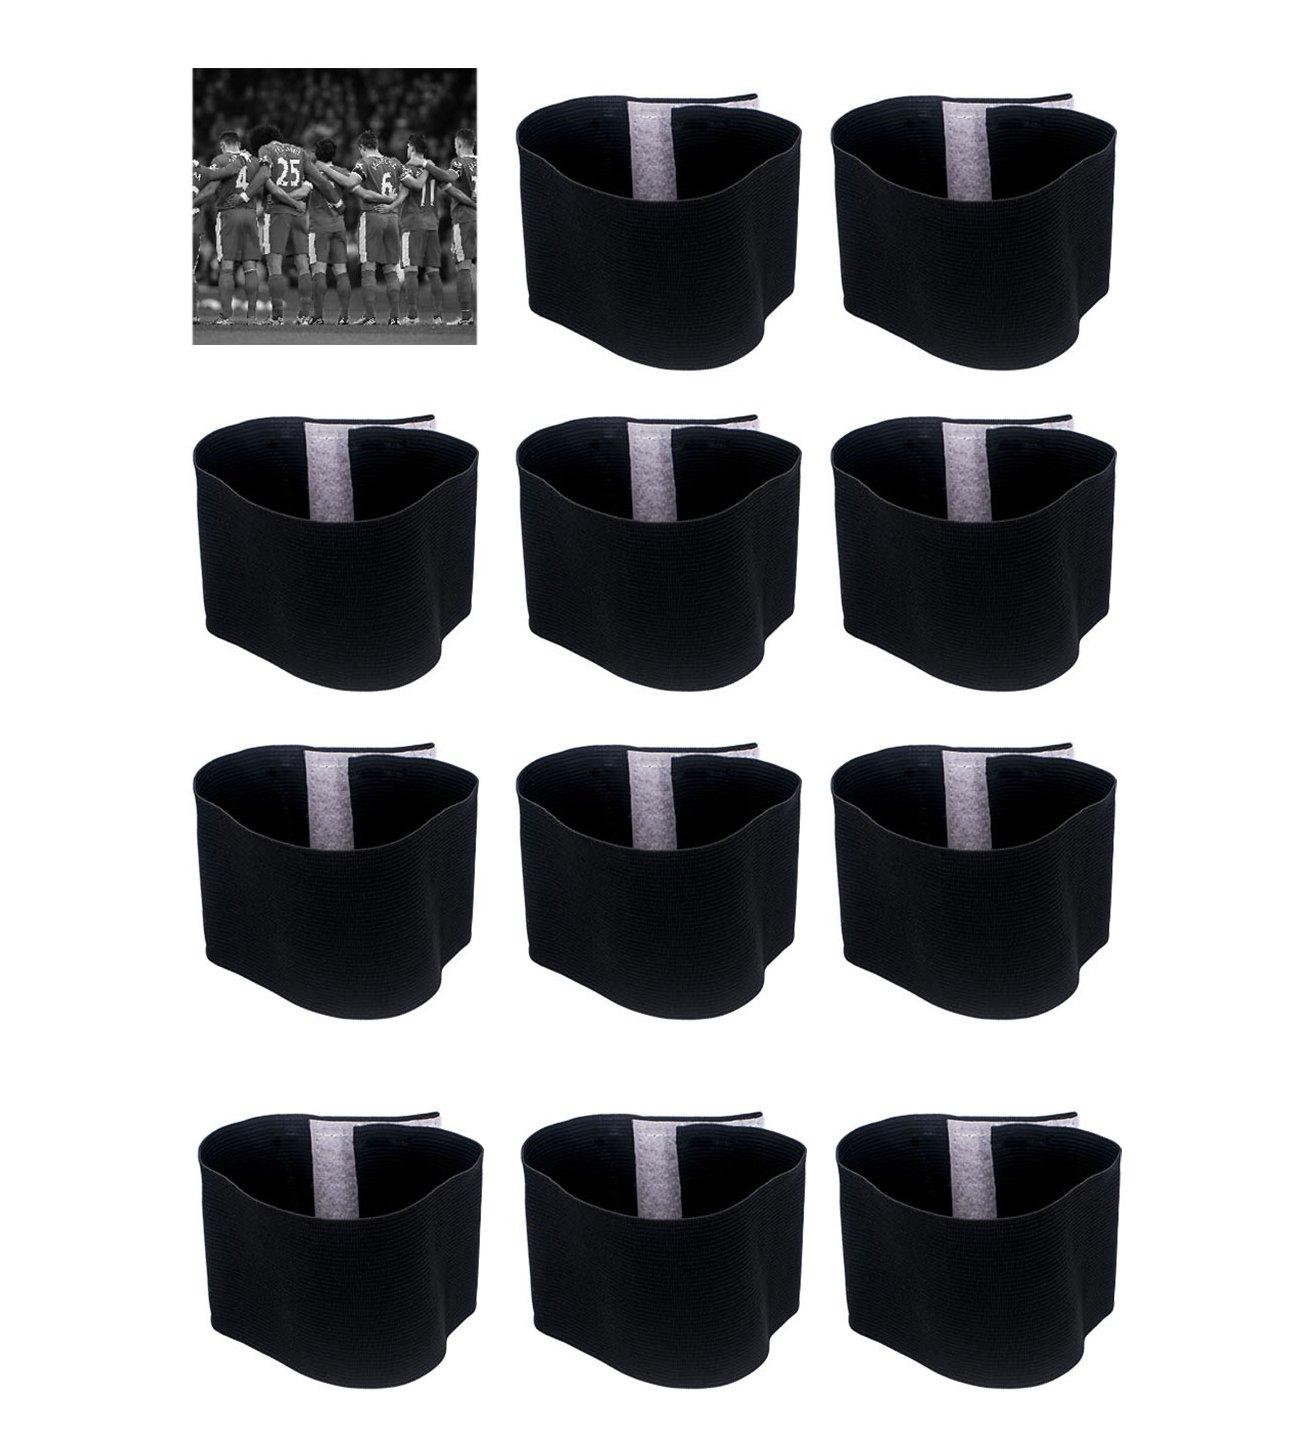 Wrzbest Black Mourning Band Soccer Football Mourning Armband,Elacstic Adjustable Funeral Armband